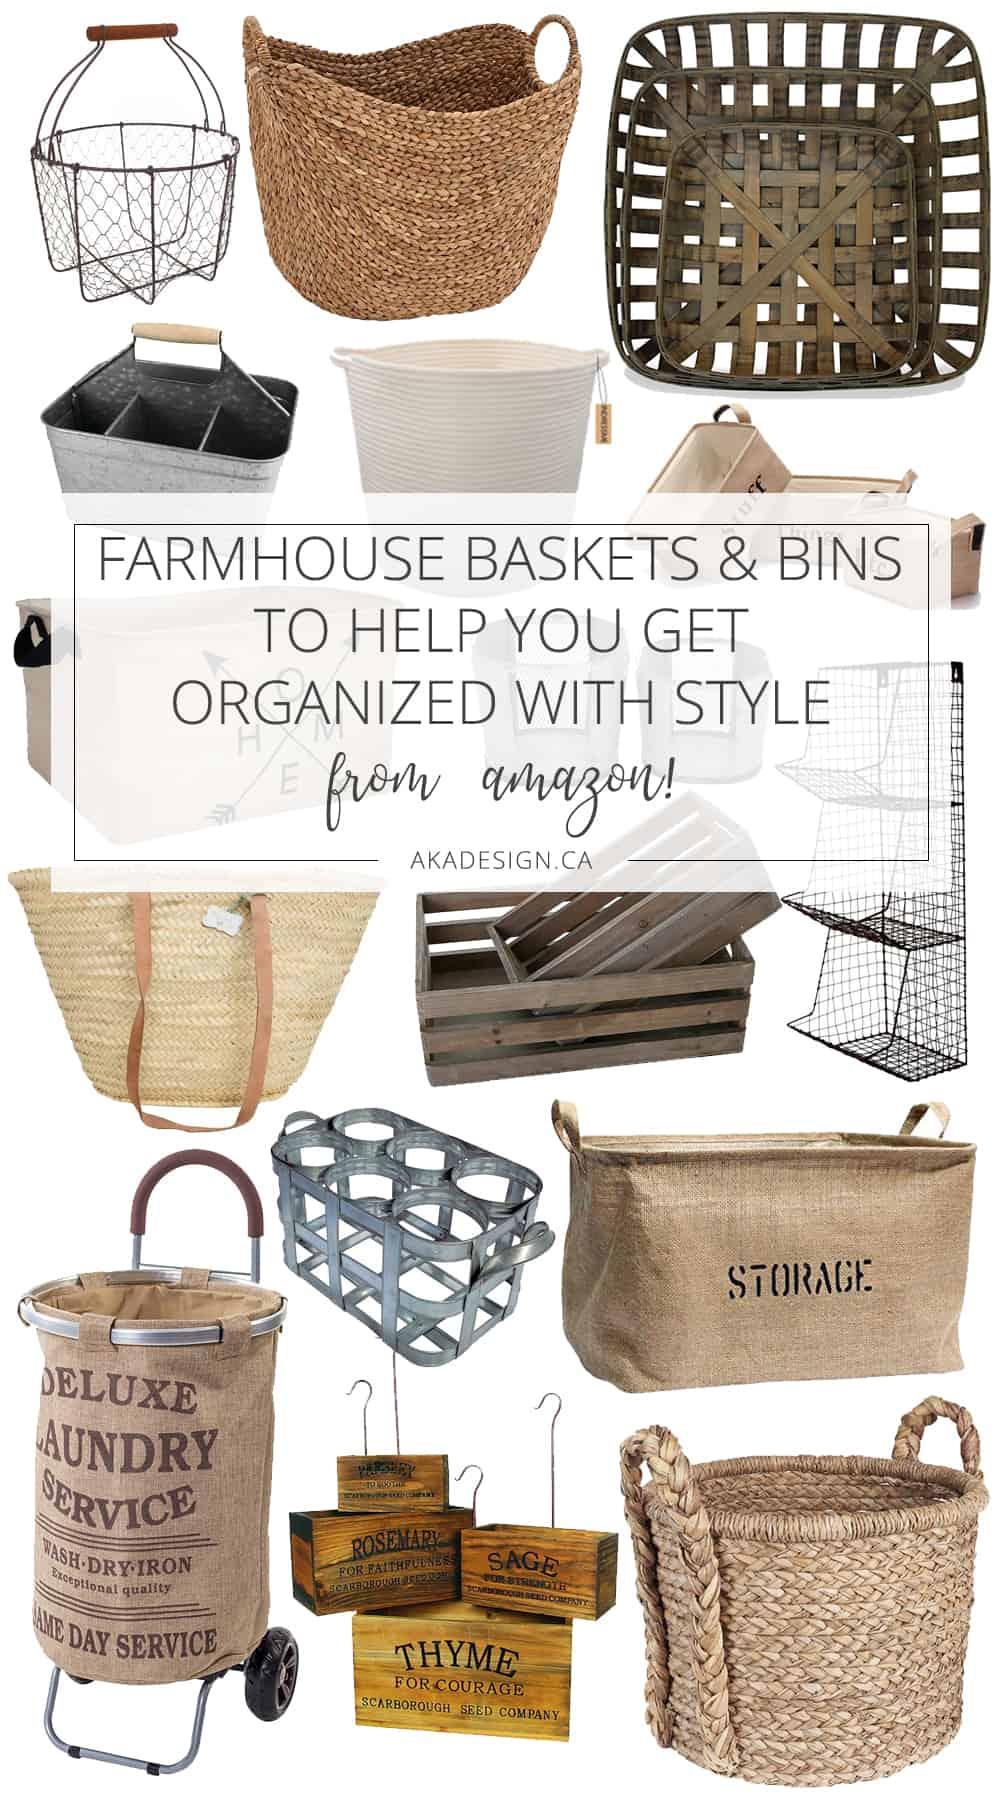 Farmhouse Baskets from Amazon?!